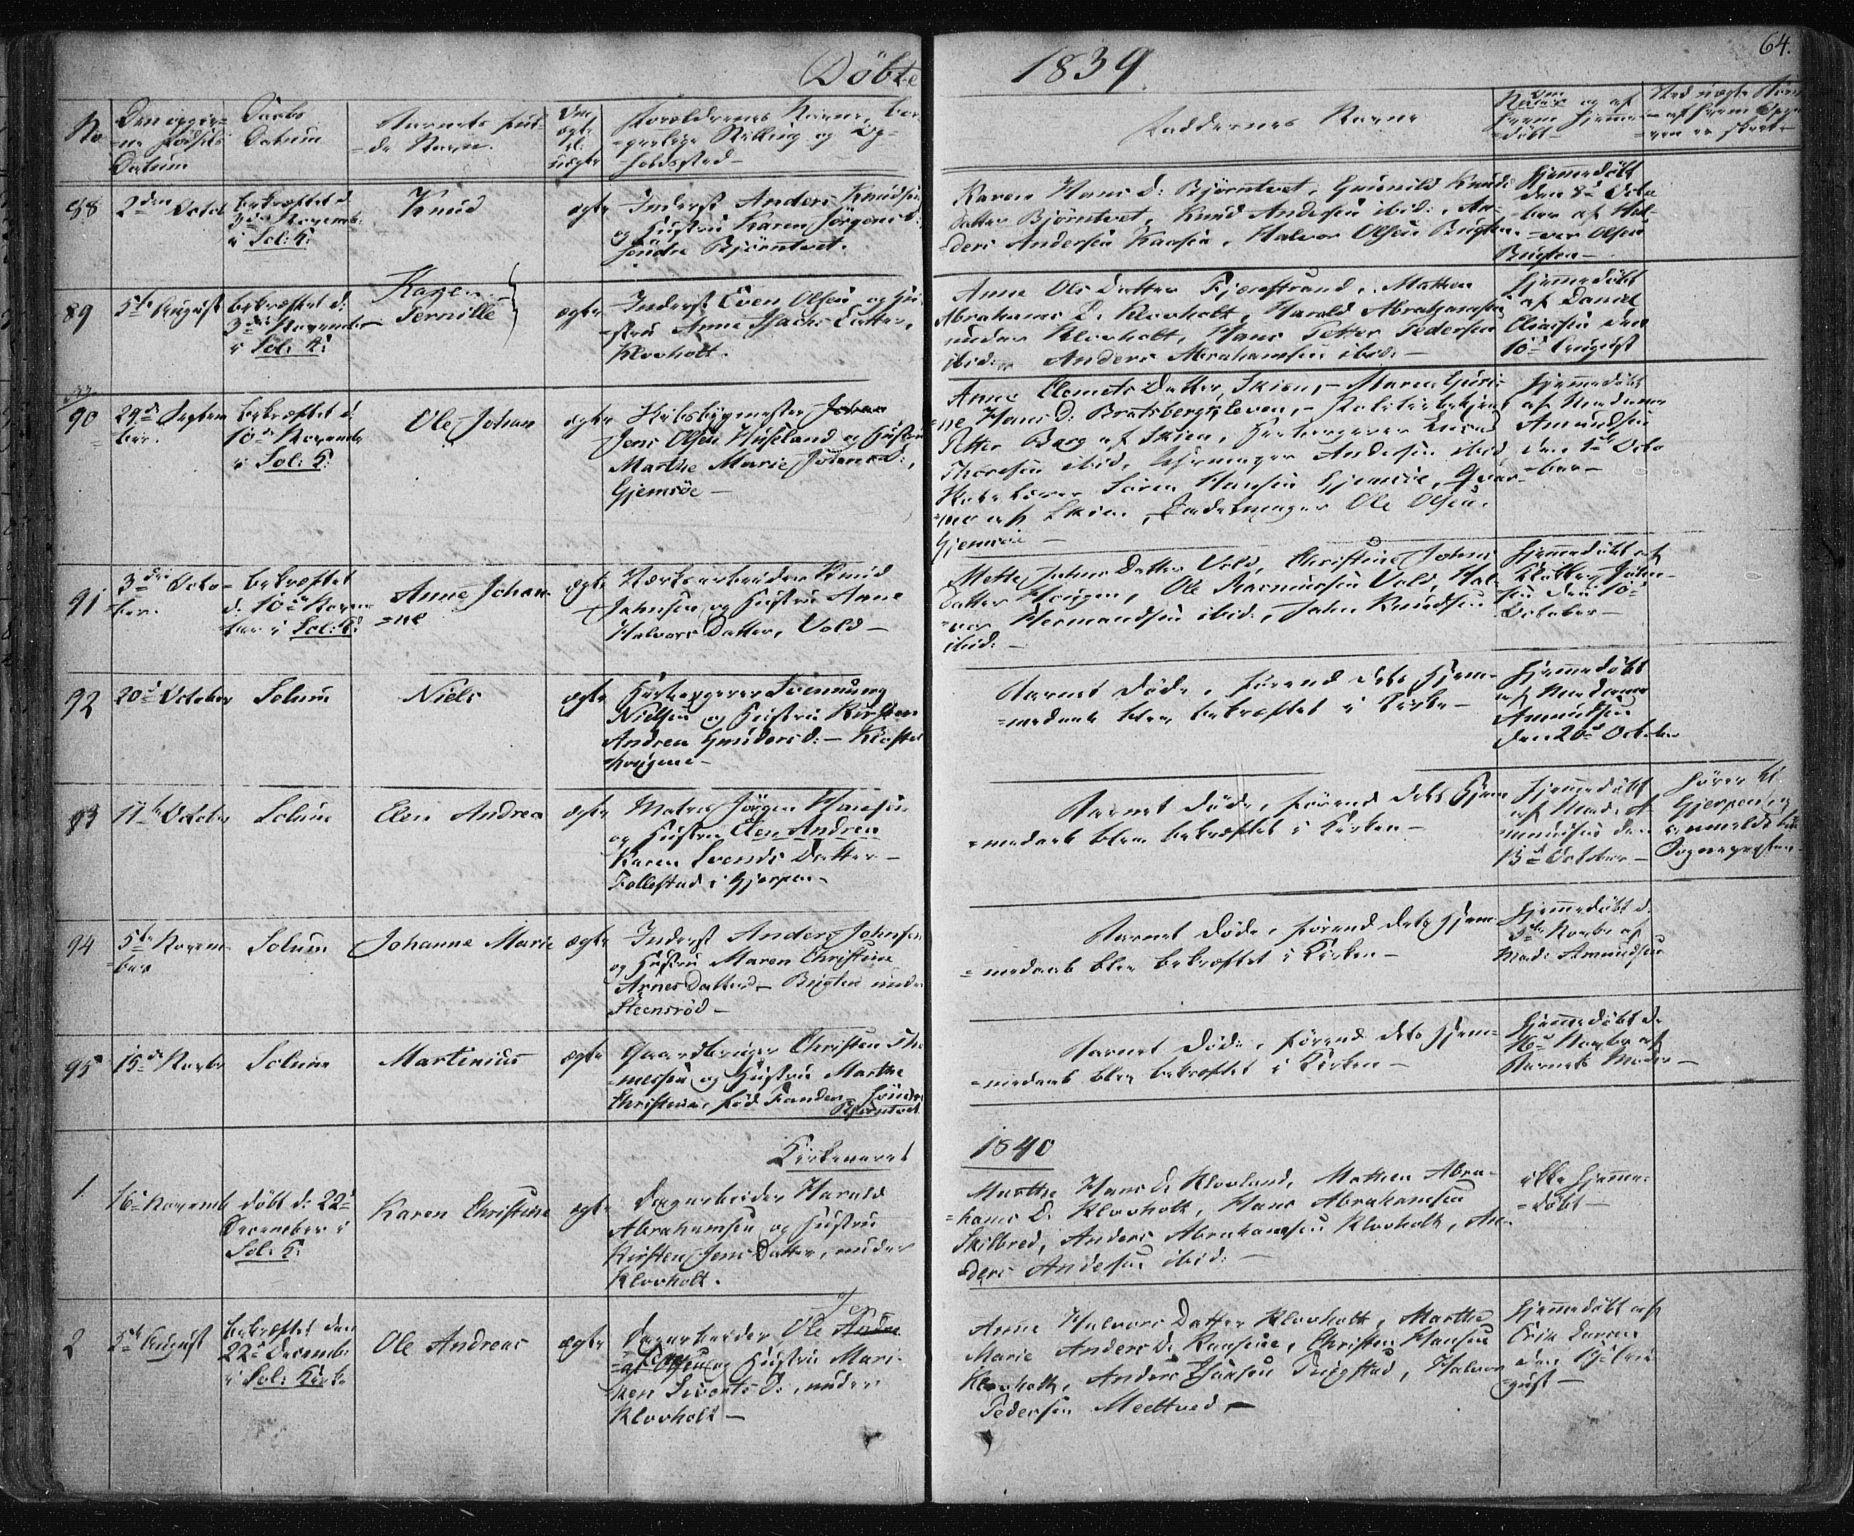 SAKO, Solum kirkebøker, F/Fa/L0005: Ministerialbok nr. I 5, 1833-1843, s. 64